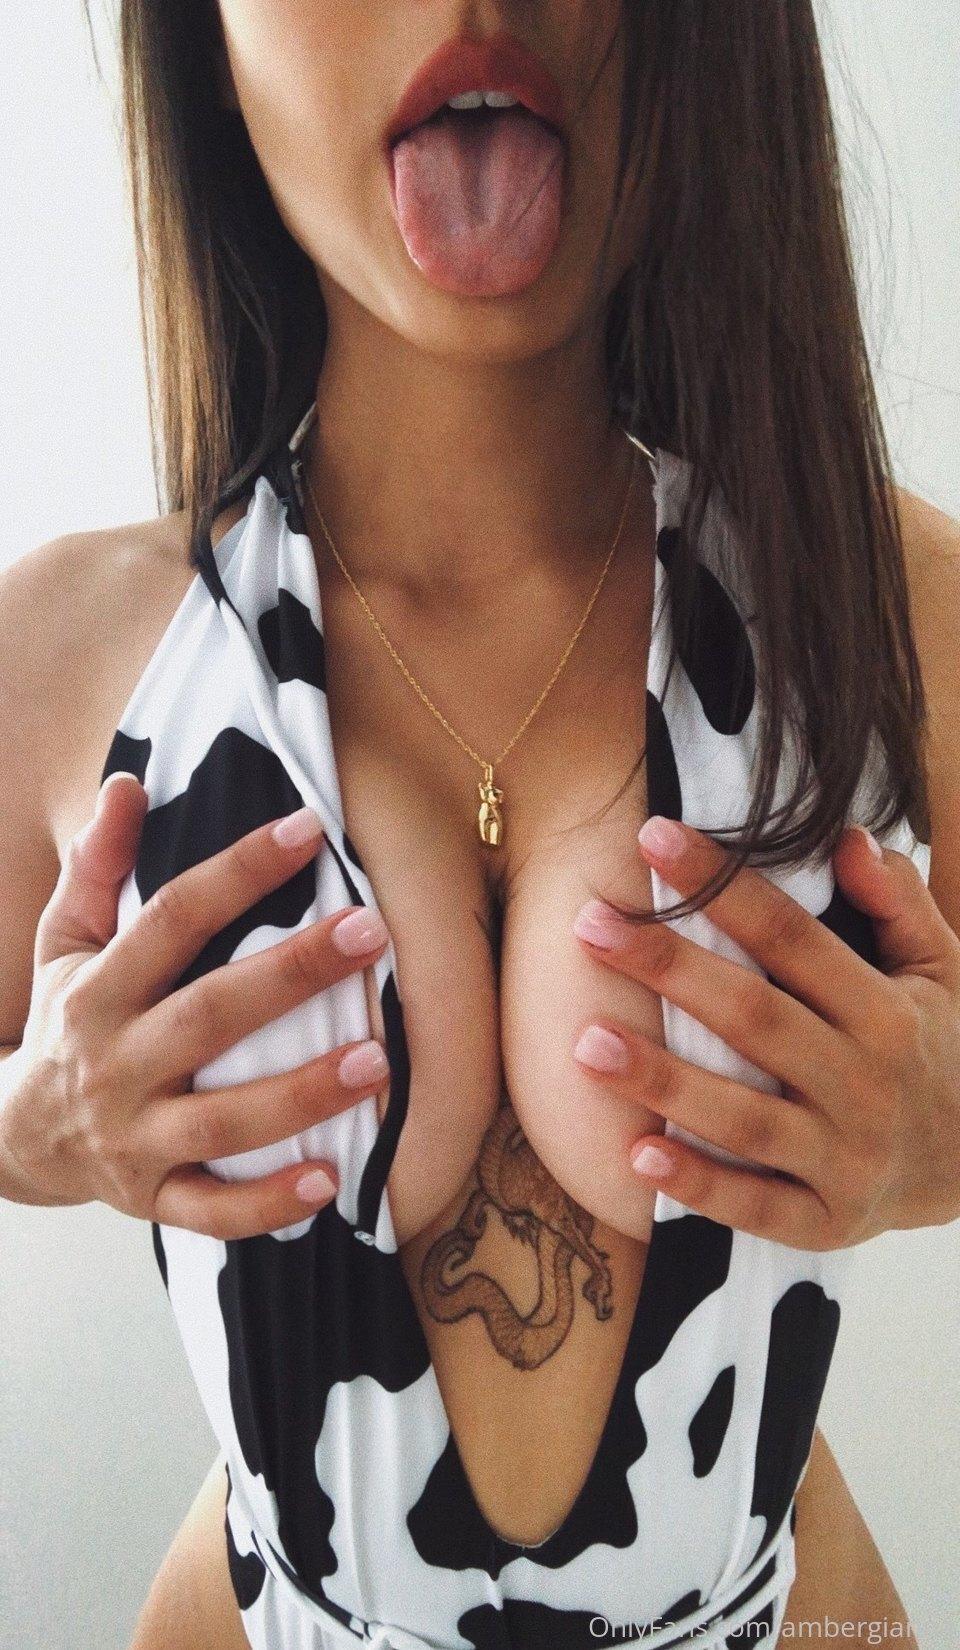 Amber Gianna Onlyfans 0045